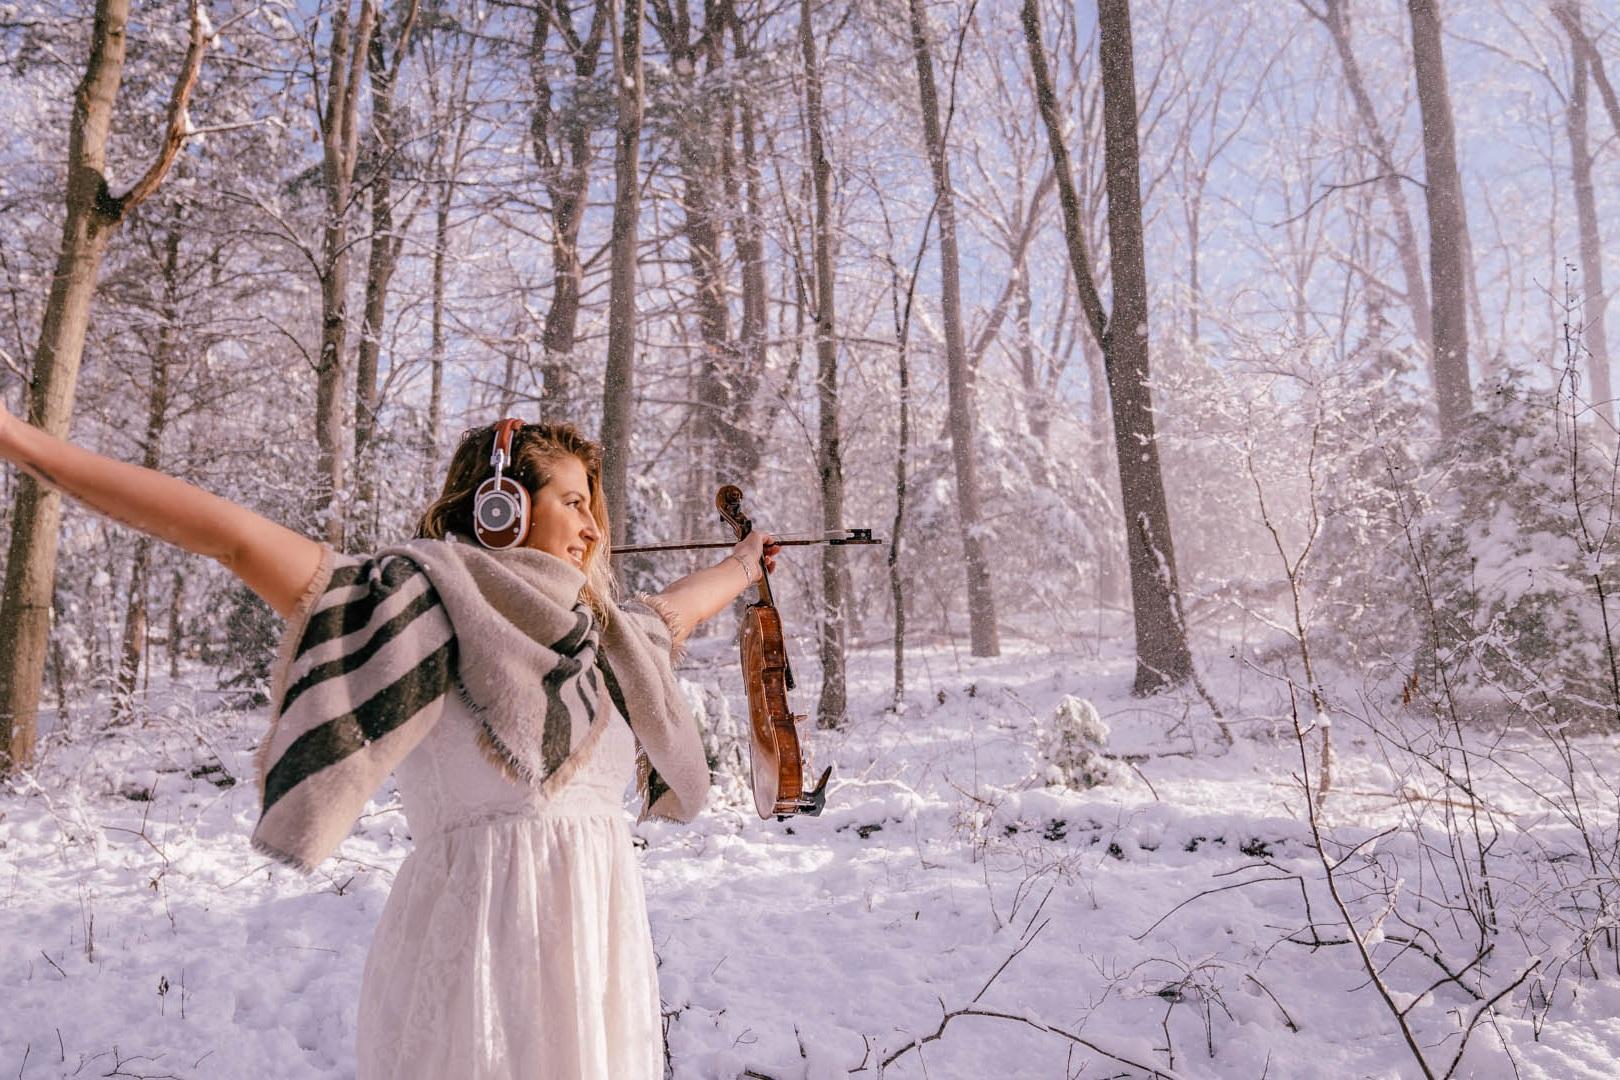 Dajana-WinterWonderland%2833of40%29.jpg